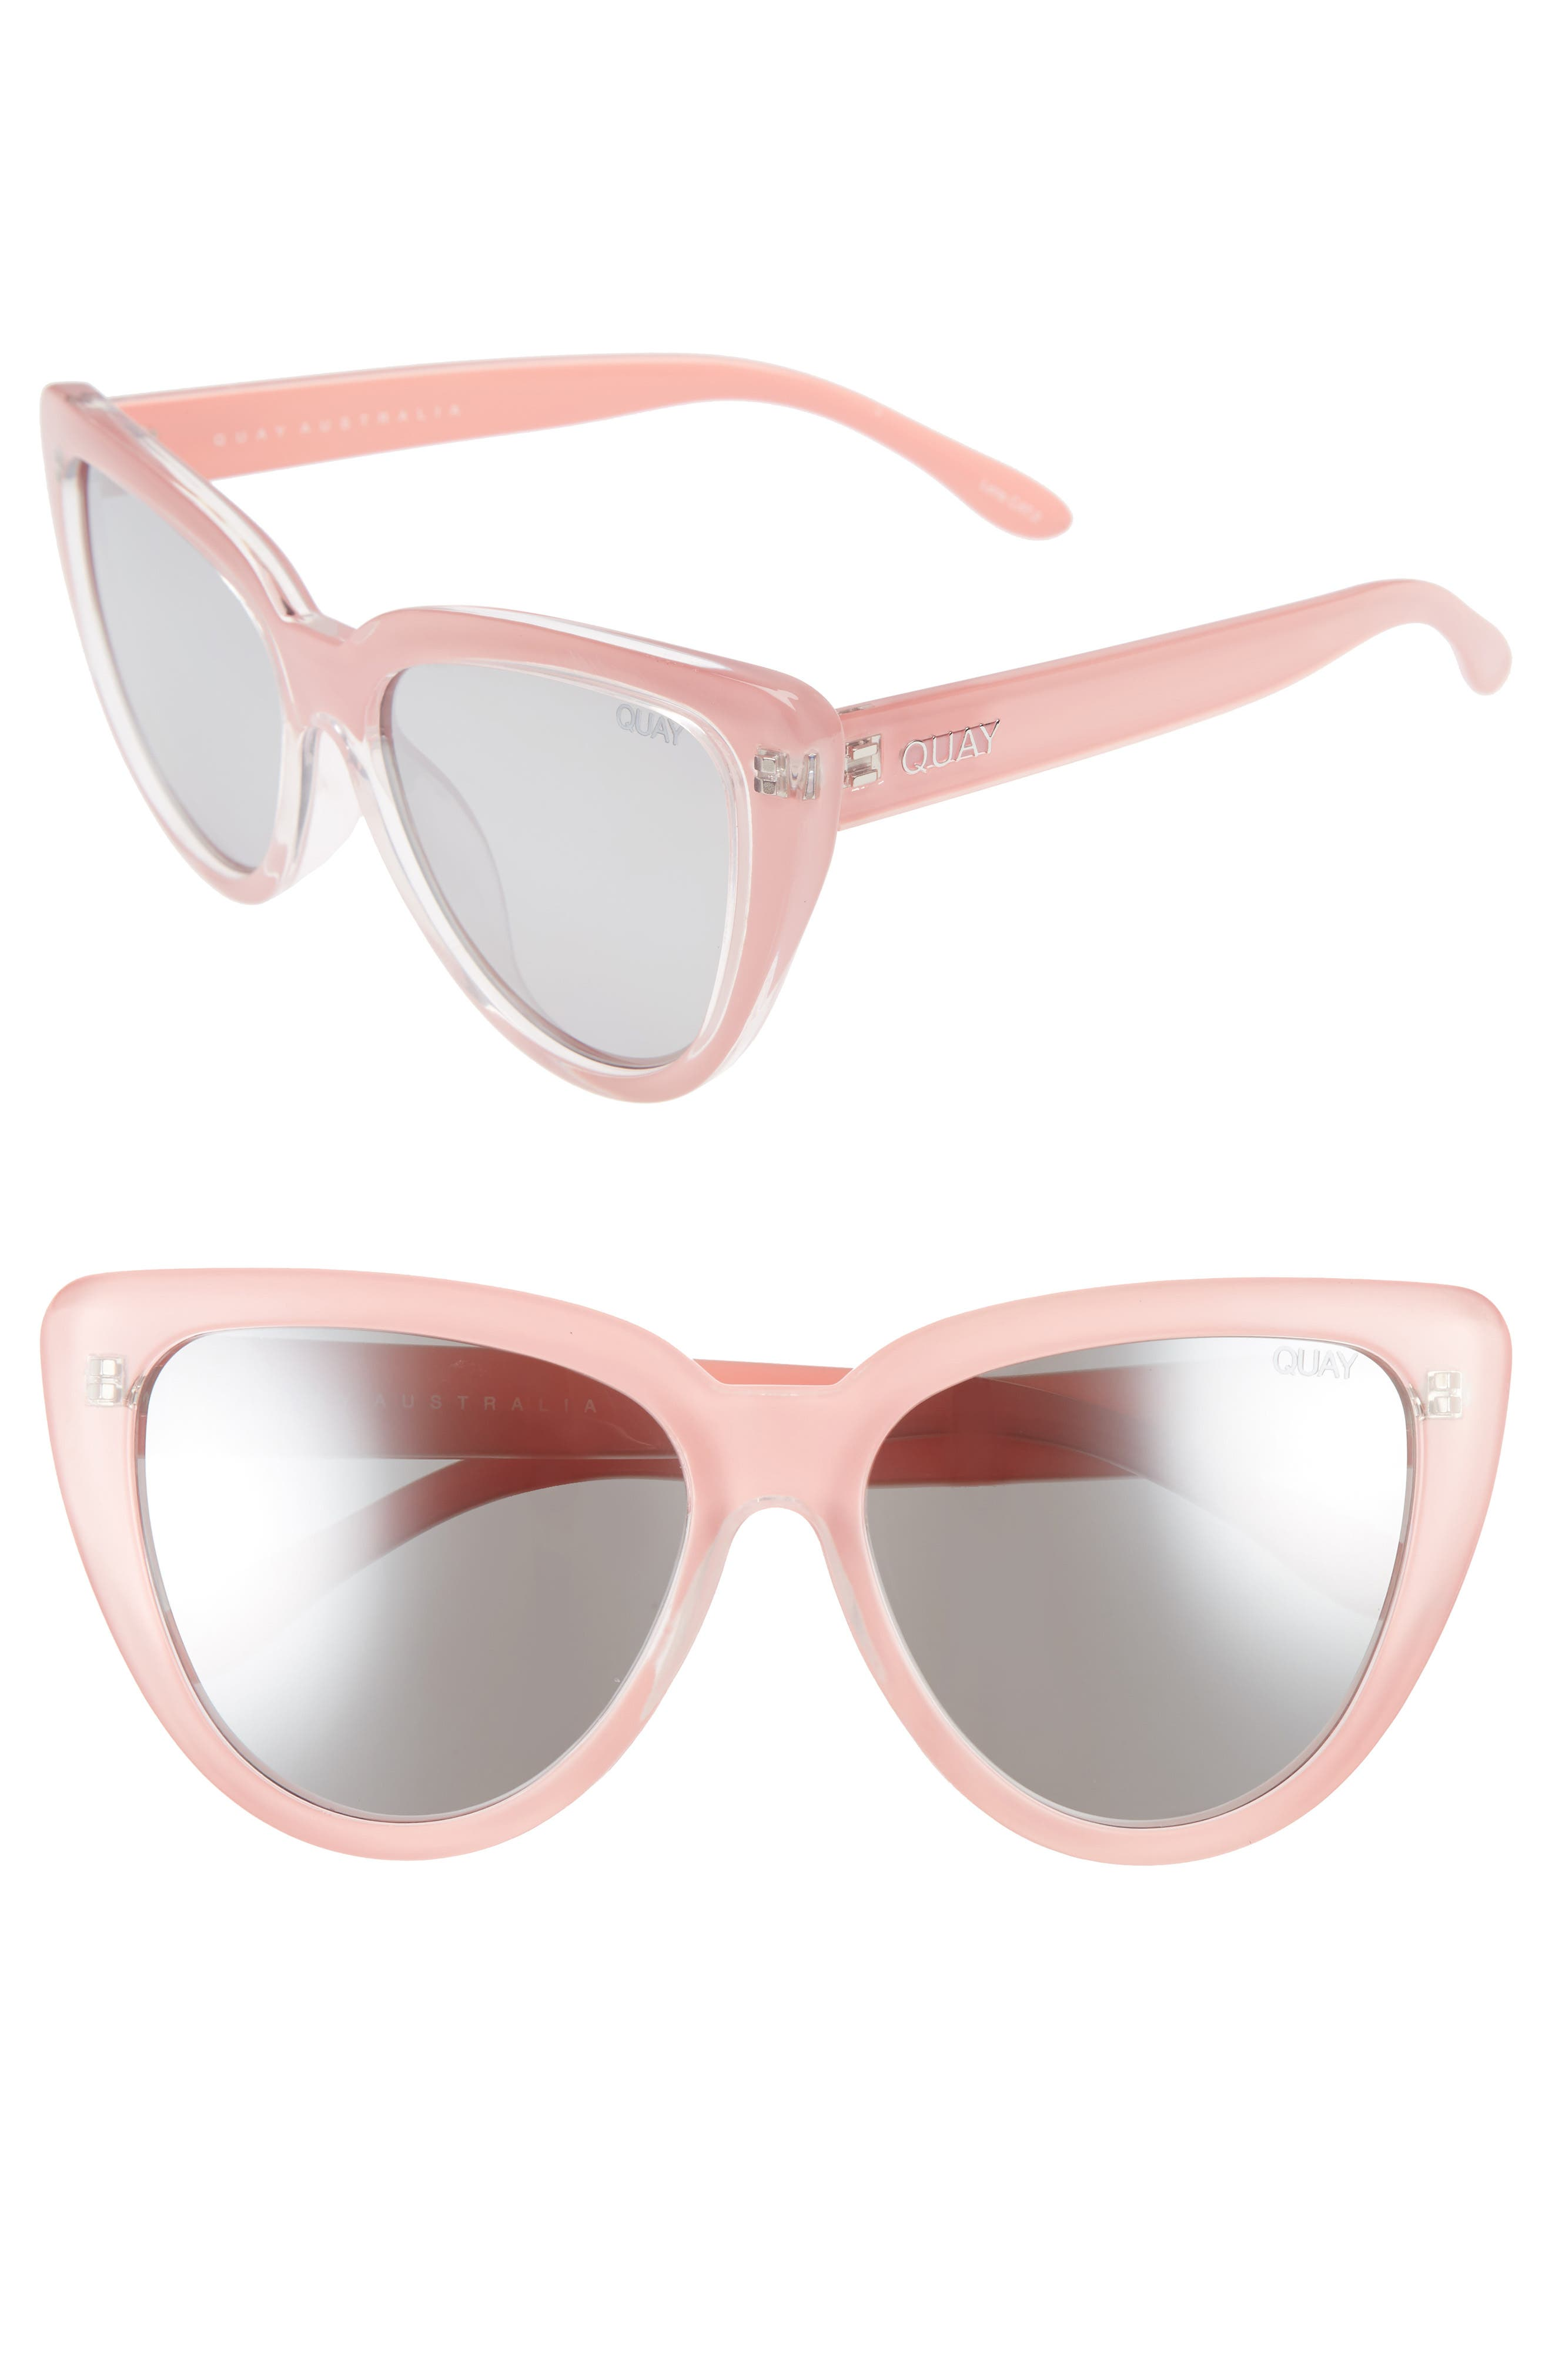 Quay Australia Stray Cat 5m Mirrored Cat Eye Sunglasses - Peach/ Gradual Flash Mirror